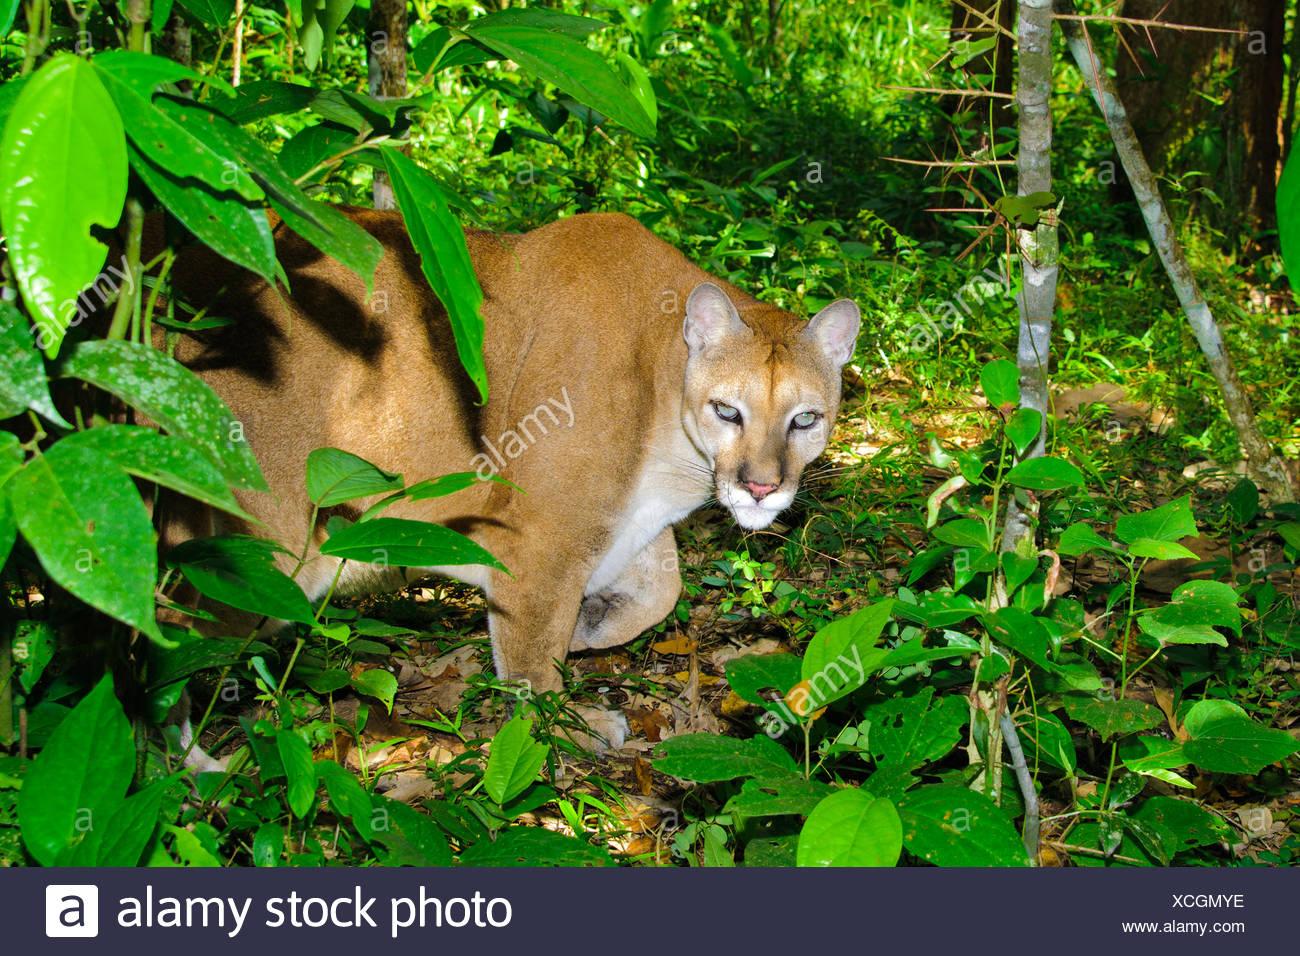 Central American Puma (Felis concolor), tropical rain forests, Belize, Central America Stock Photo